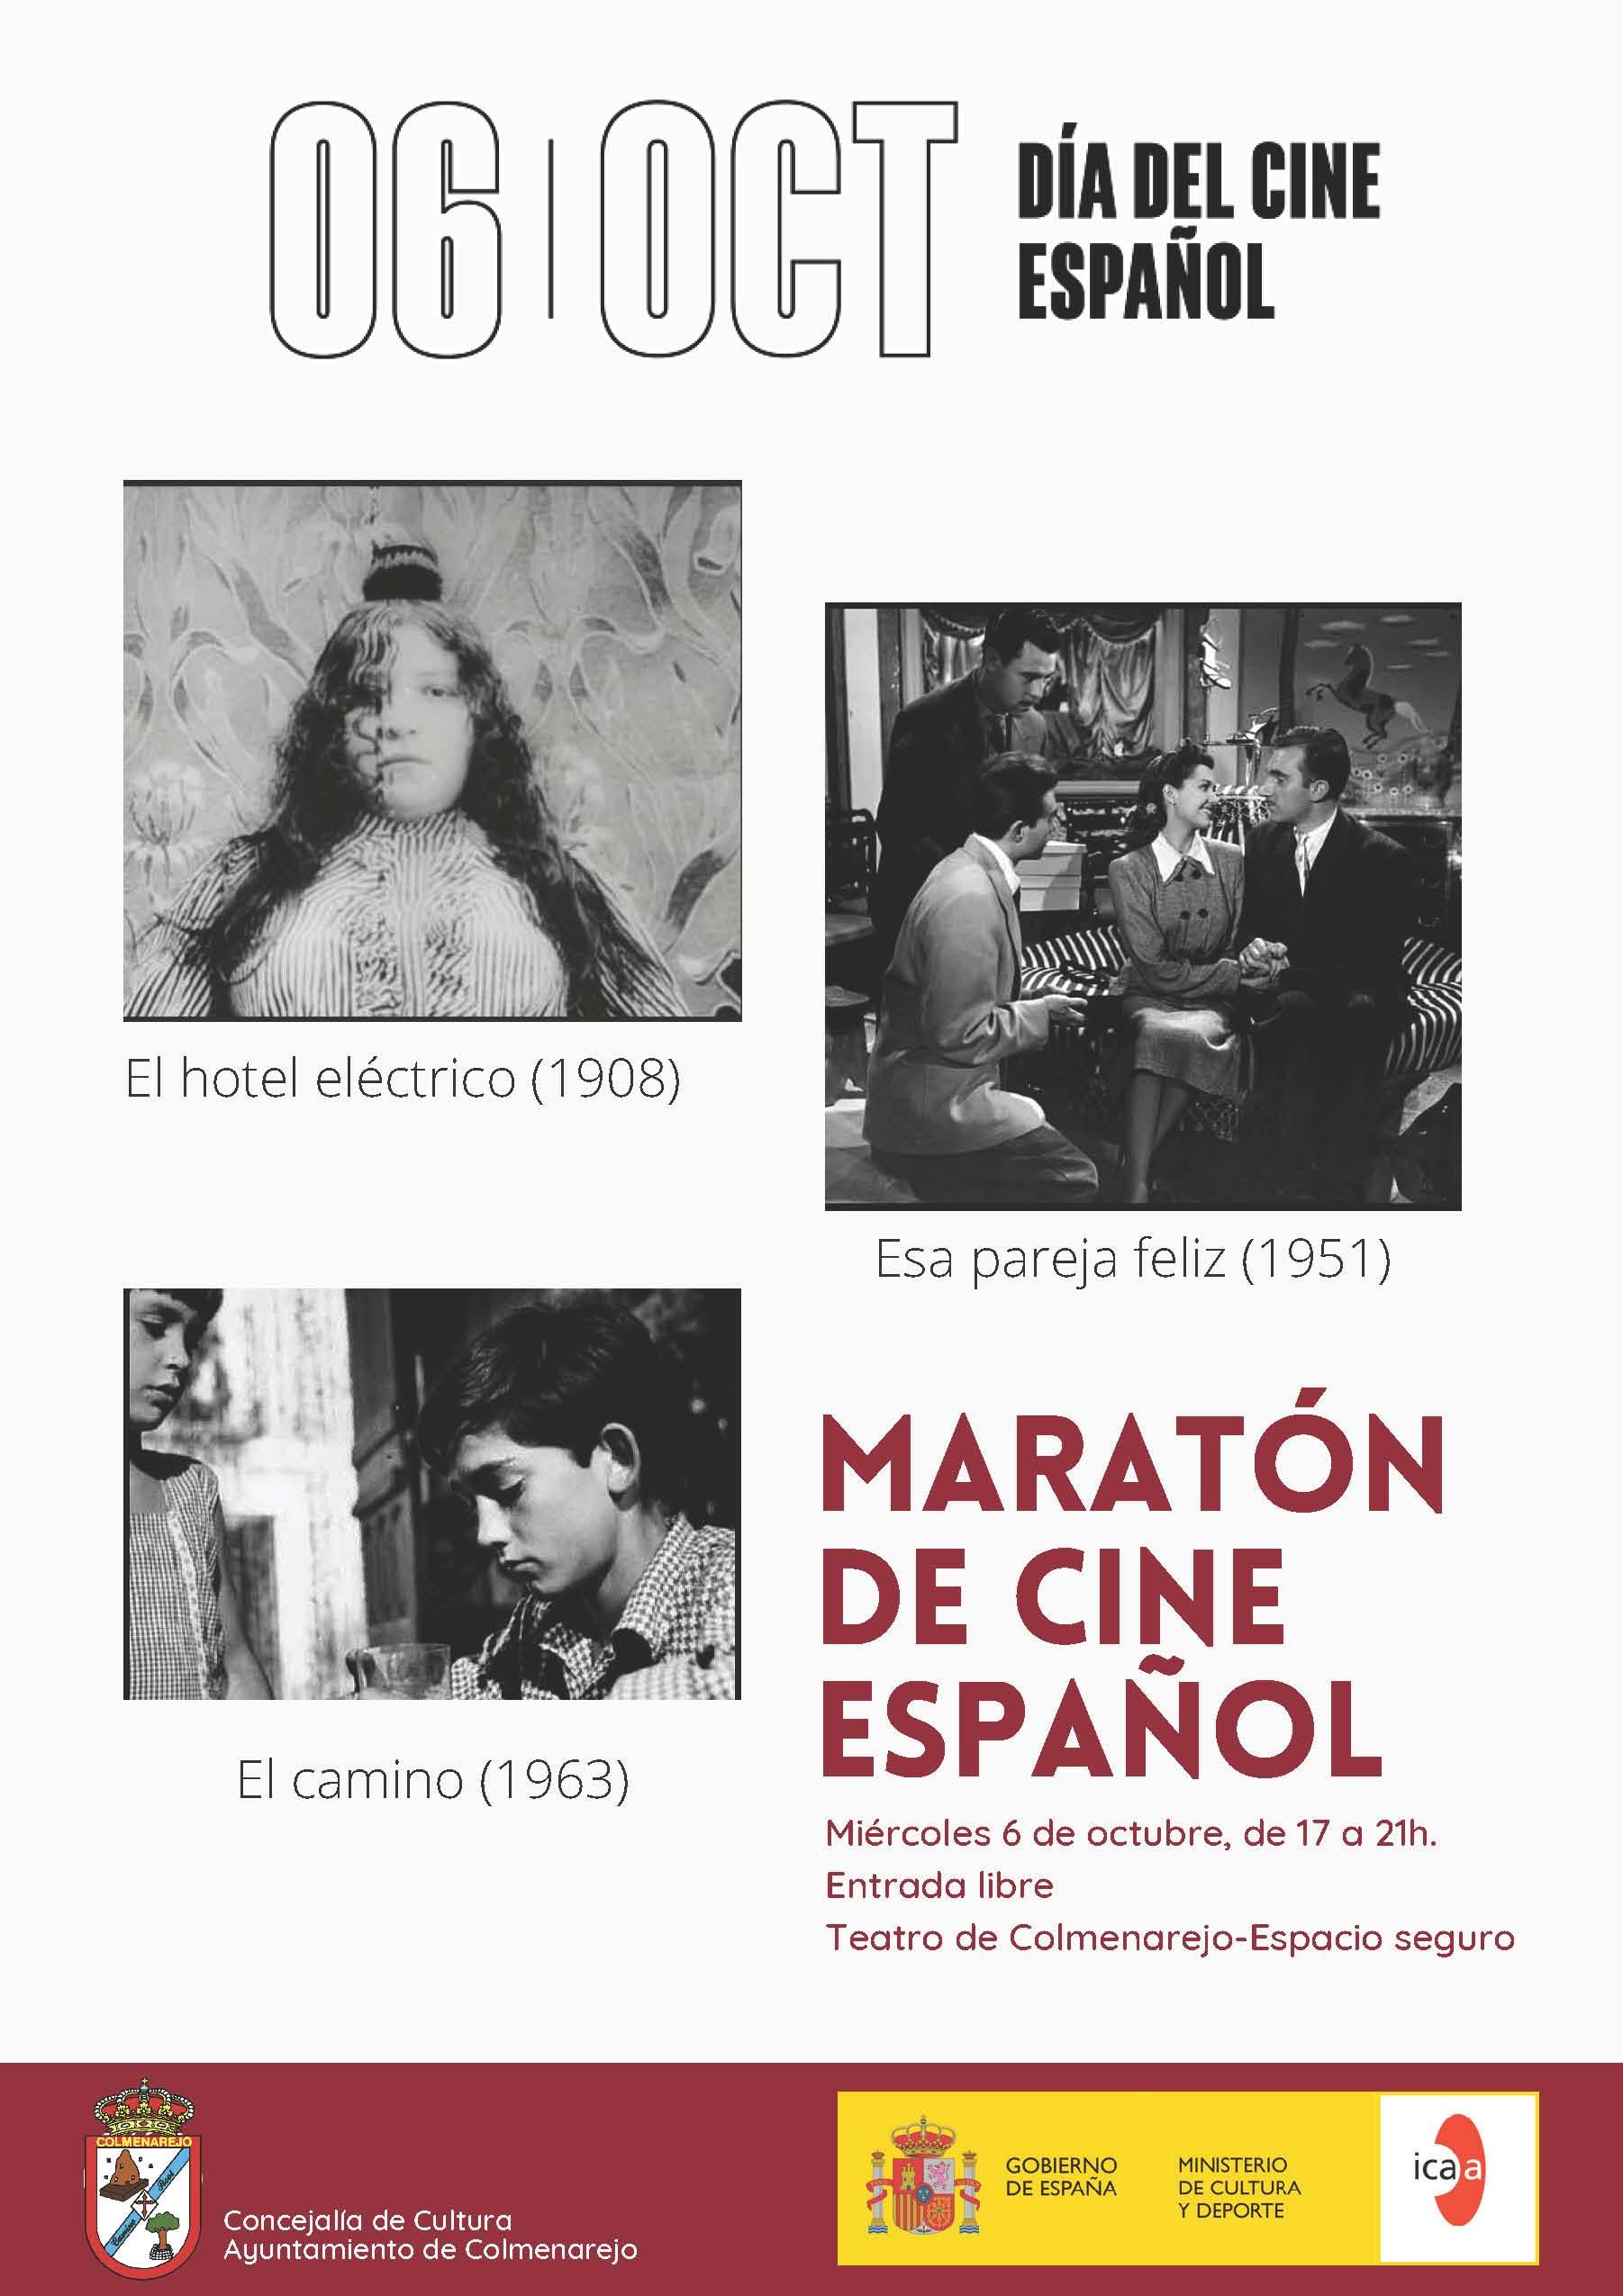 Cine: MARATÓN DE CINE ESPAÑOL @ Teatro de Colmenarejo